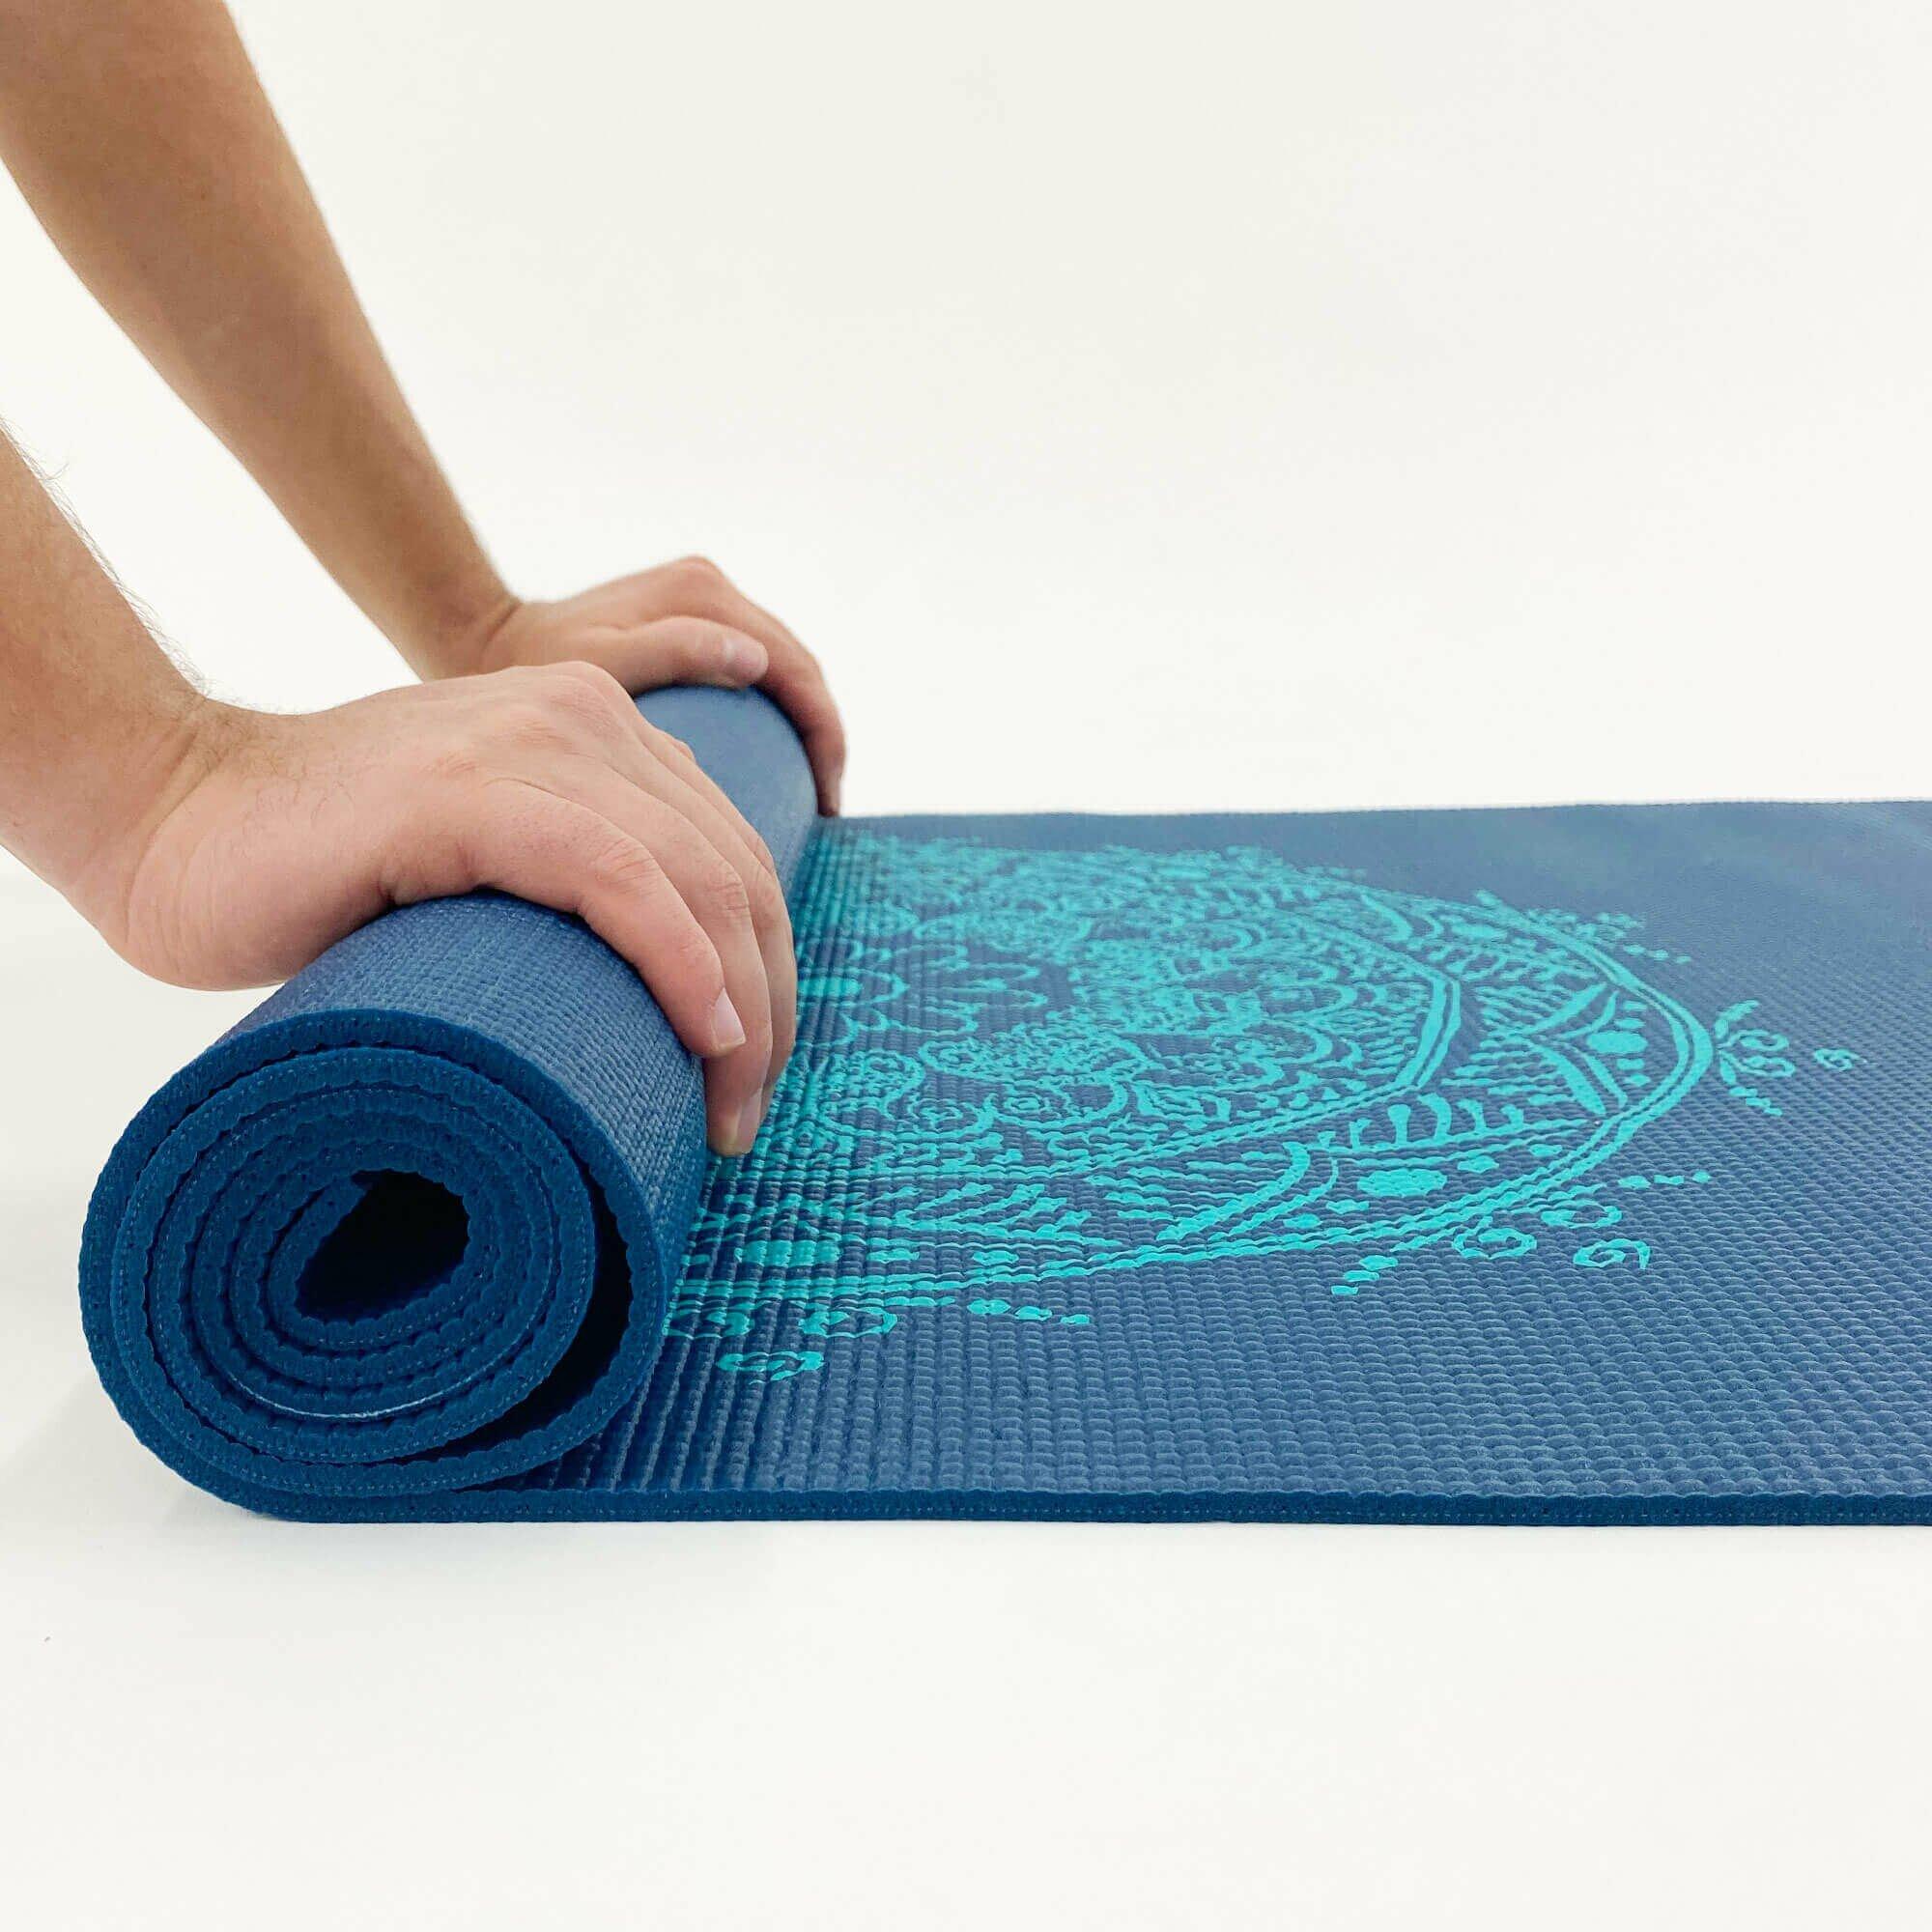 tapete-yoga-leela-mandala-yogateria-petroleo-turquesa-5